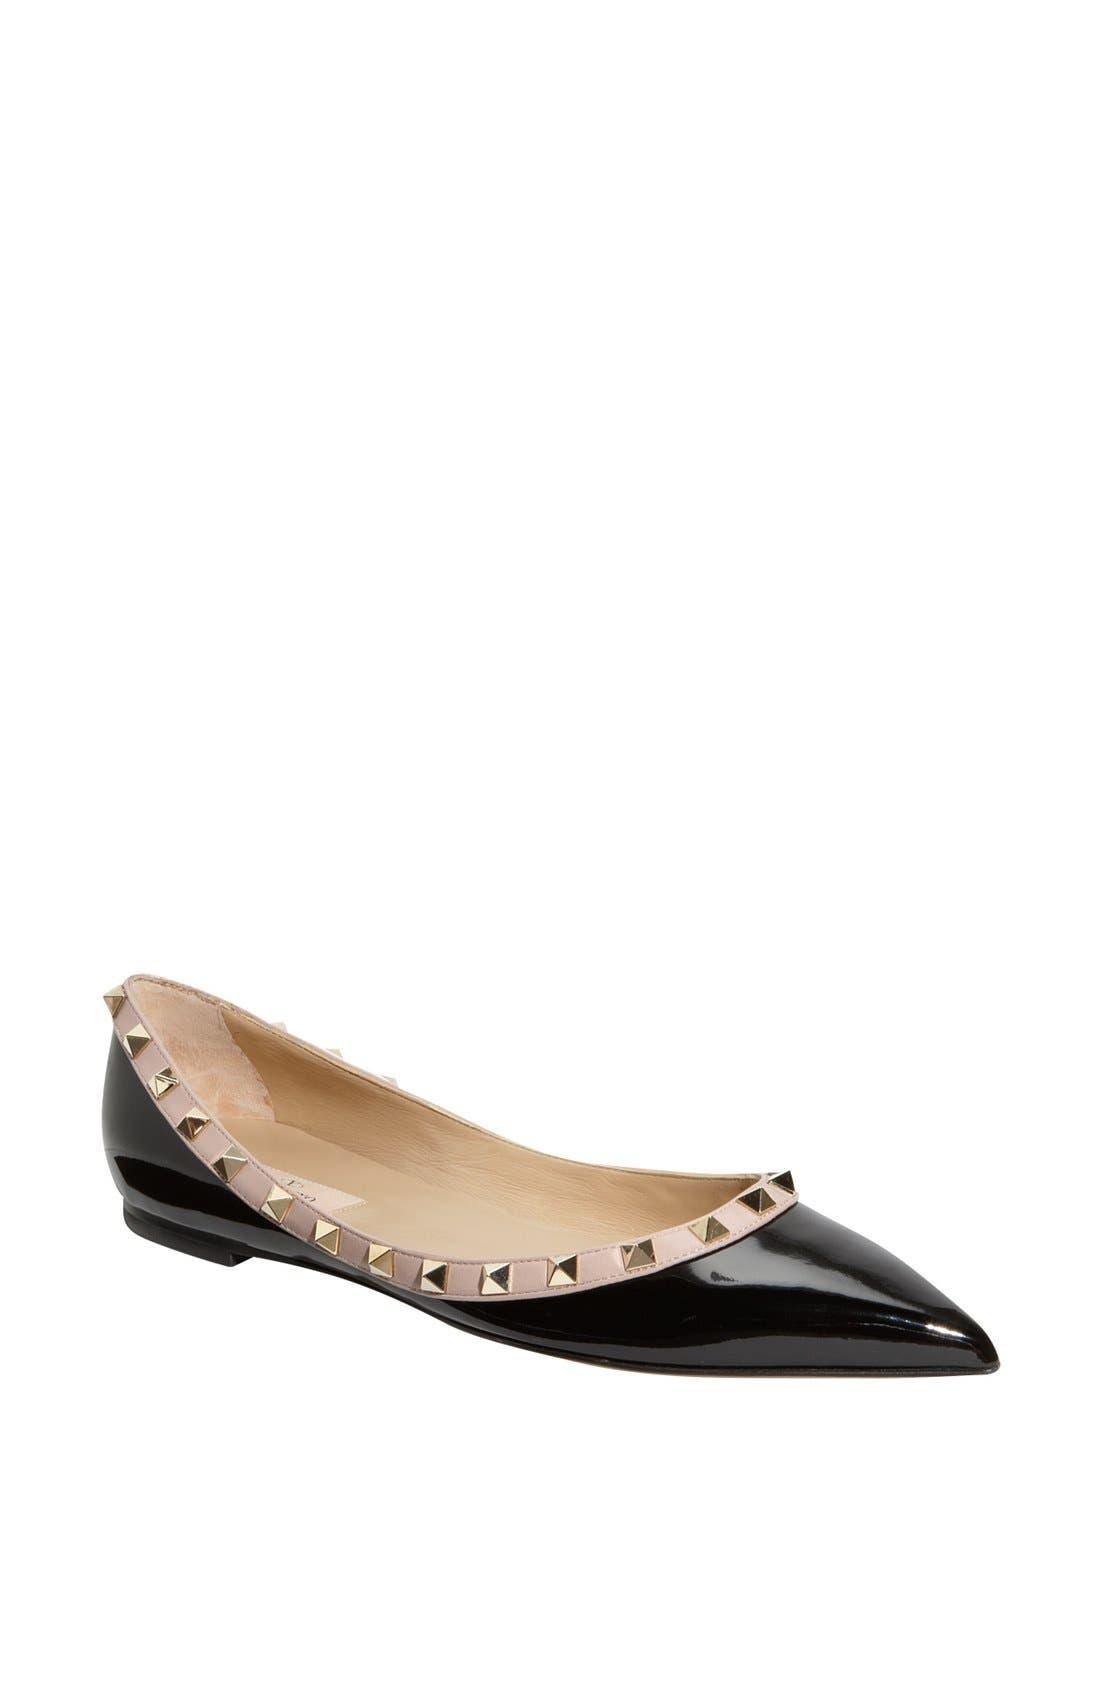 Alternate Image 1 Selected - Valentino Rockstud Ballerina Flat (Women)